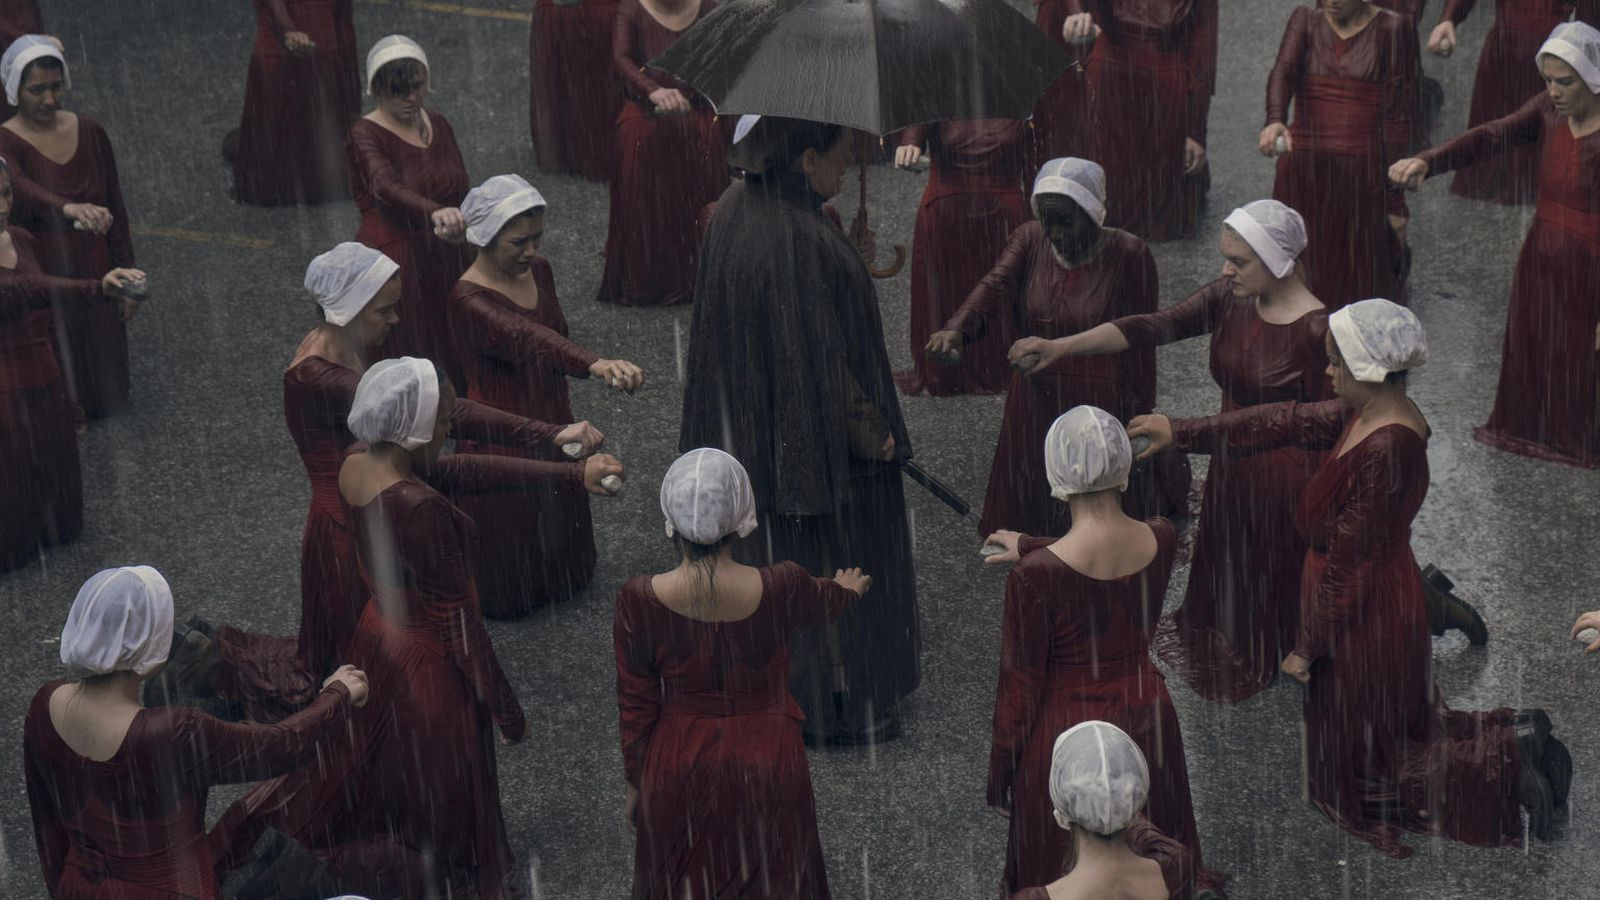 The Handmaid's Tale - Les servantes se rebiffent